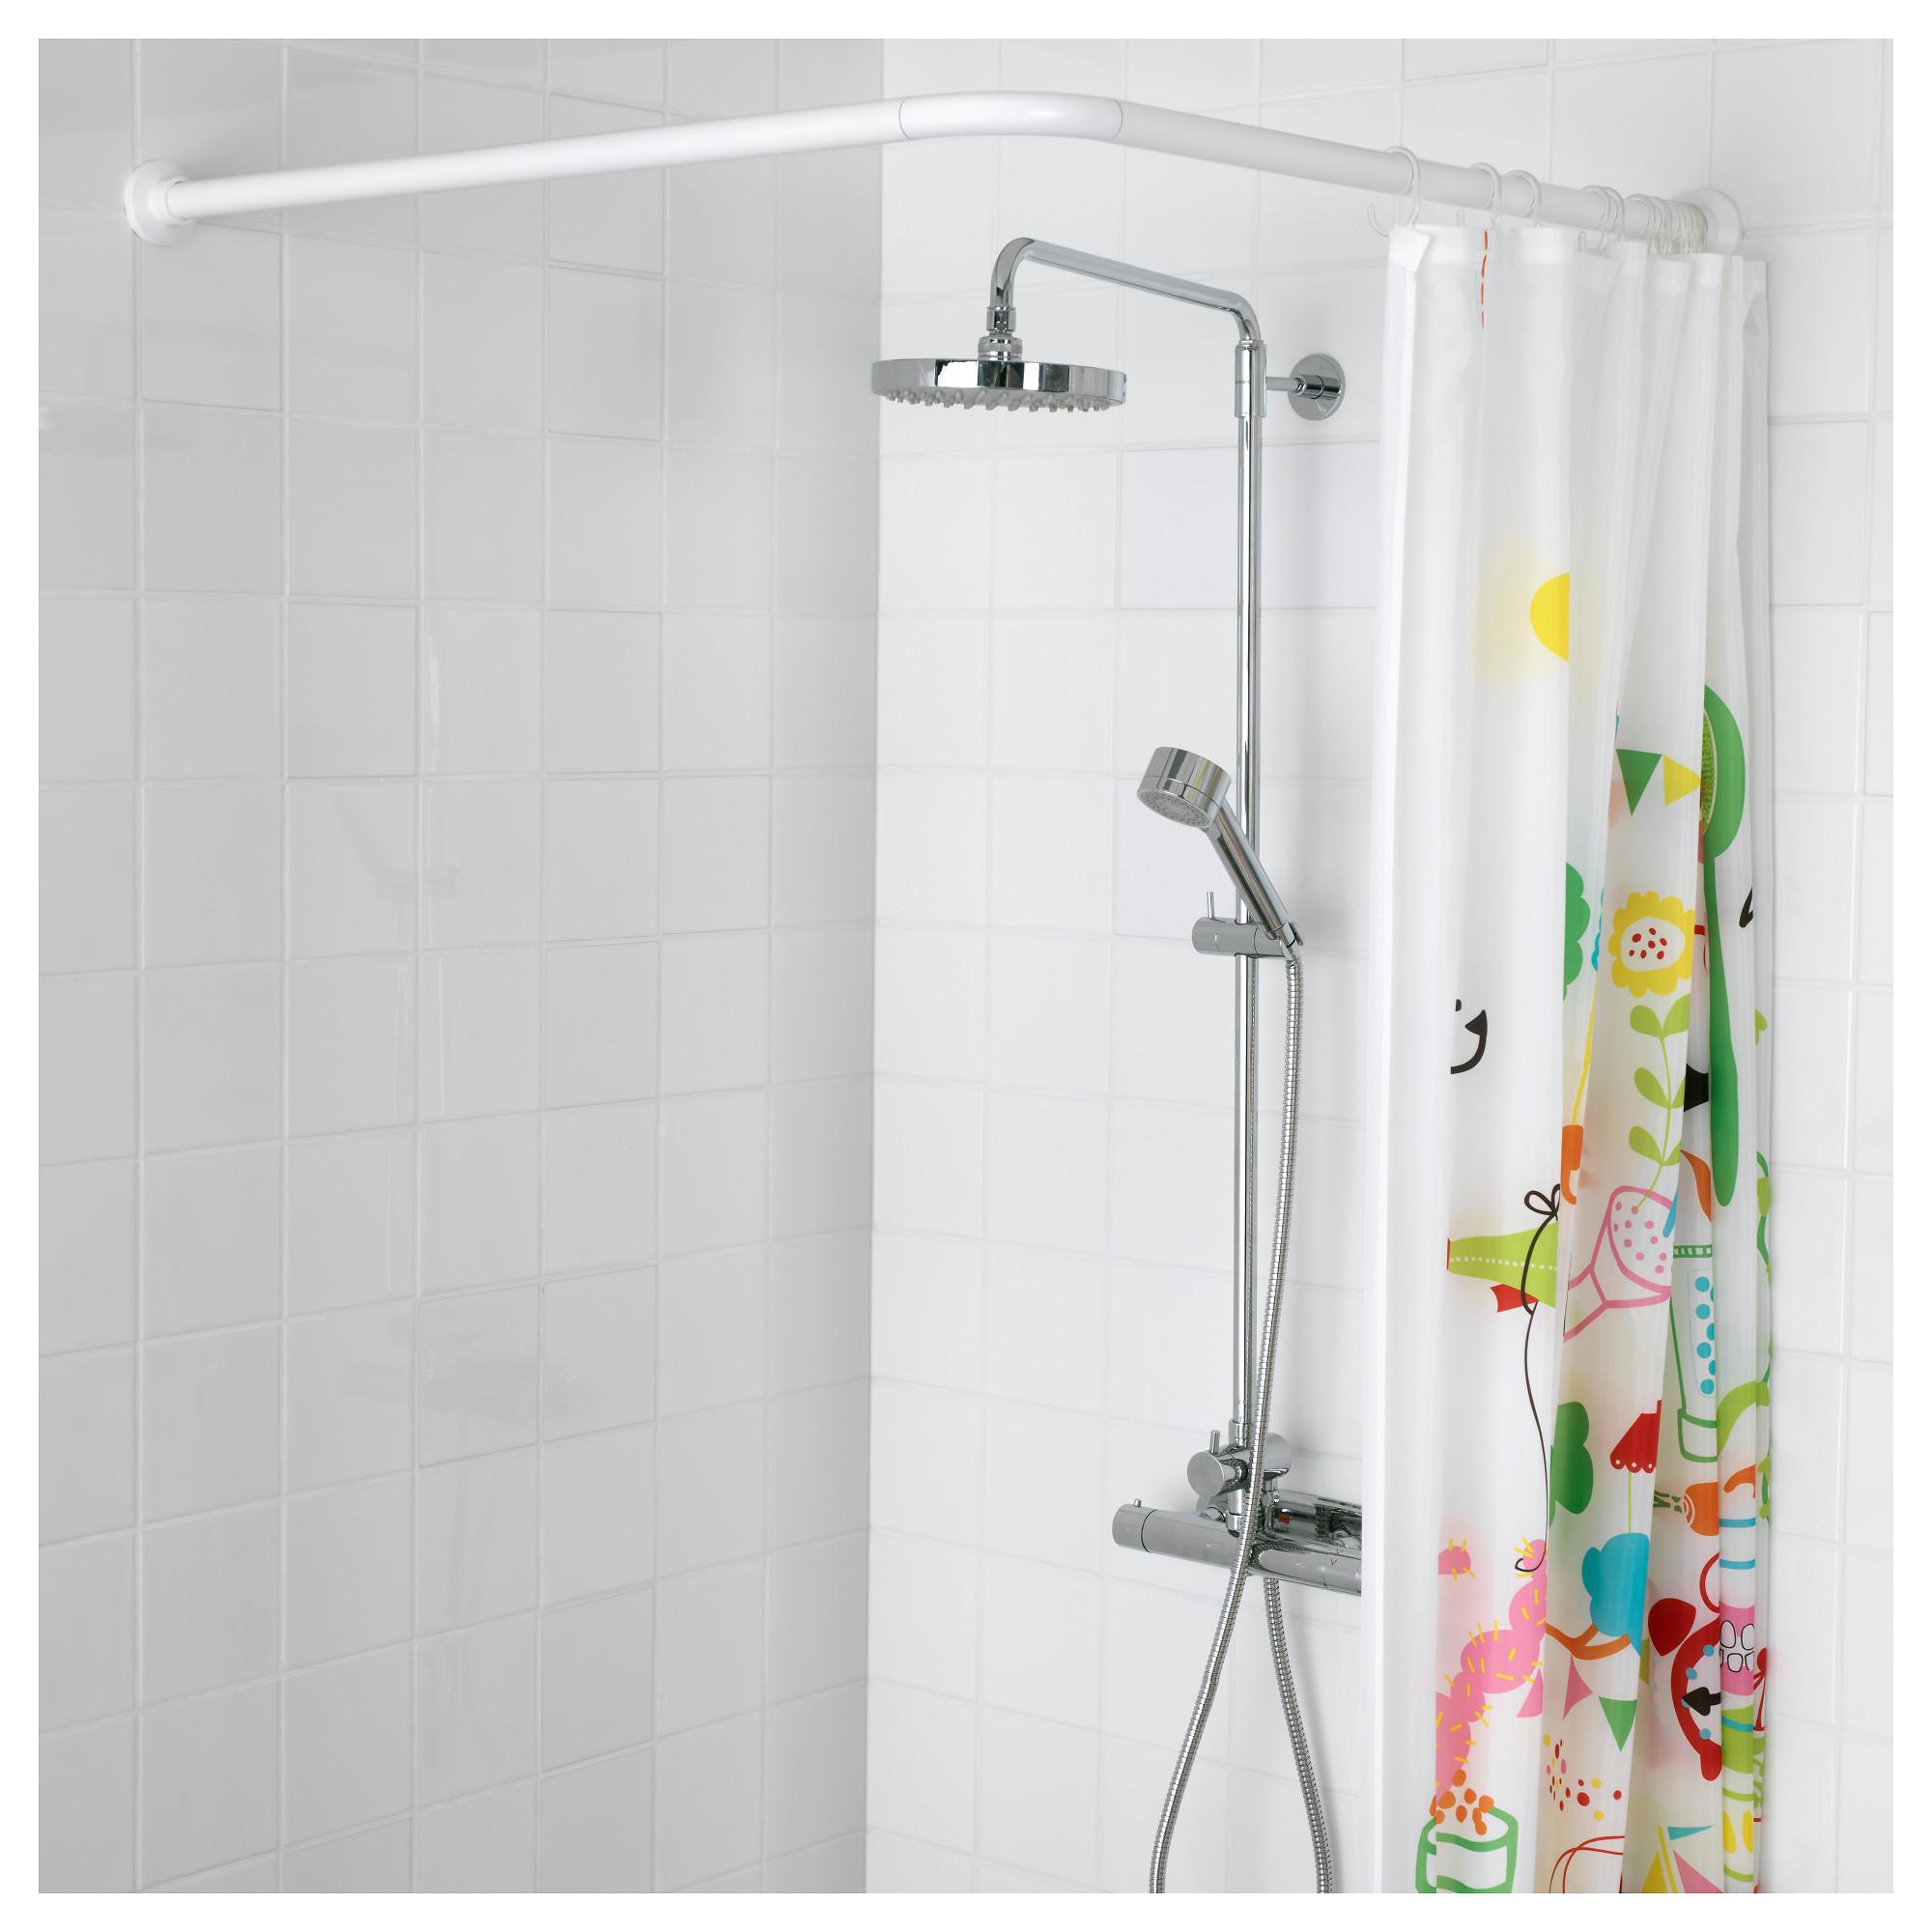 Corner Shower Curtain Rod Ikea.Ikea Lithuania Shop For Furniture Lighting Home